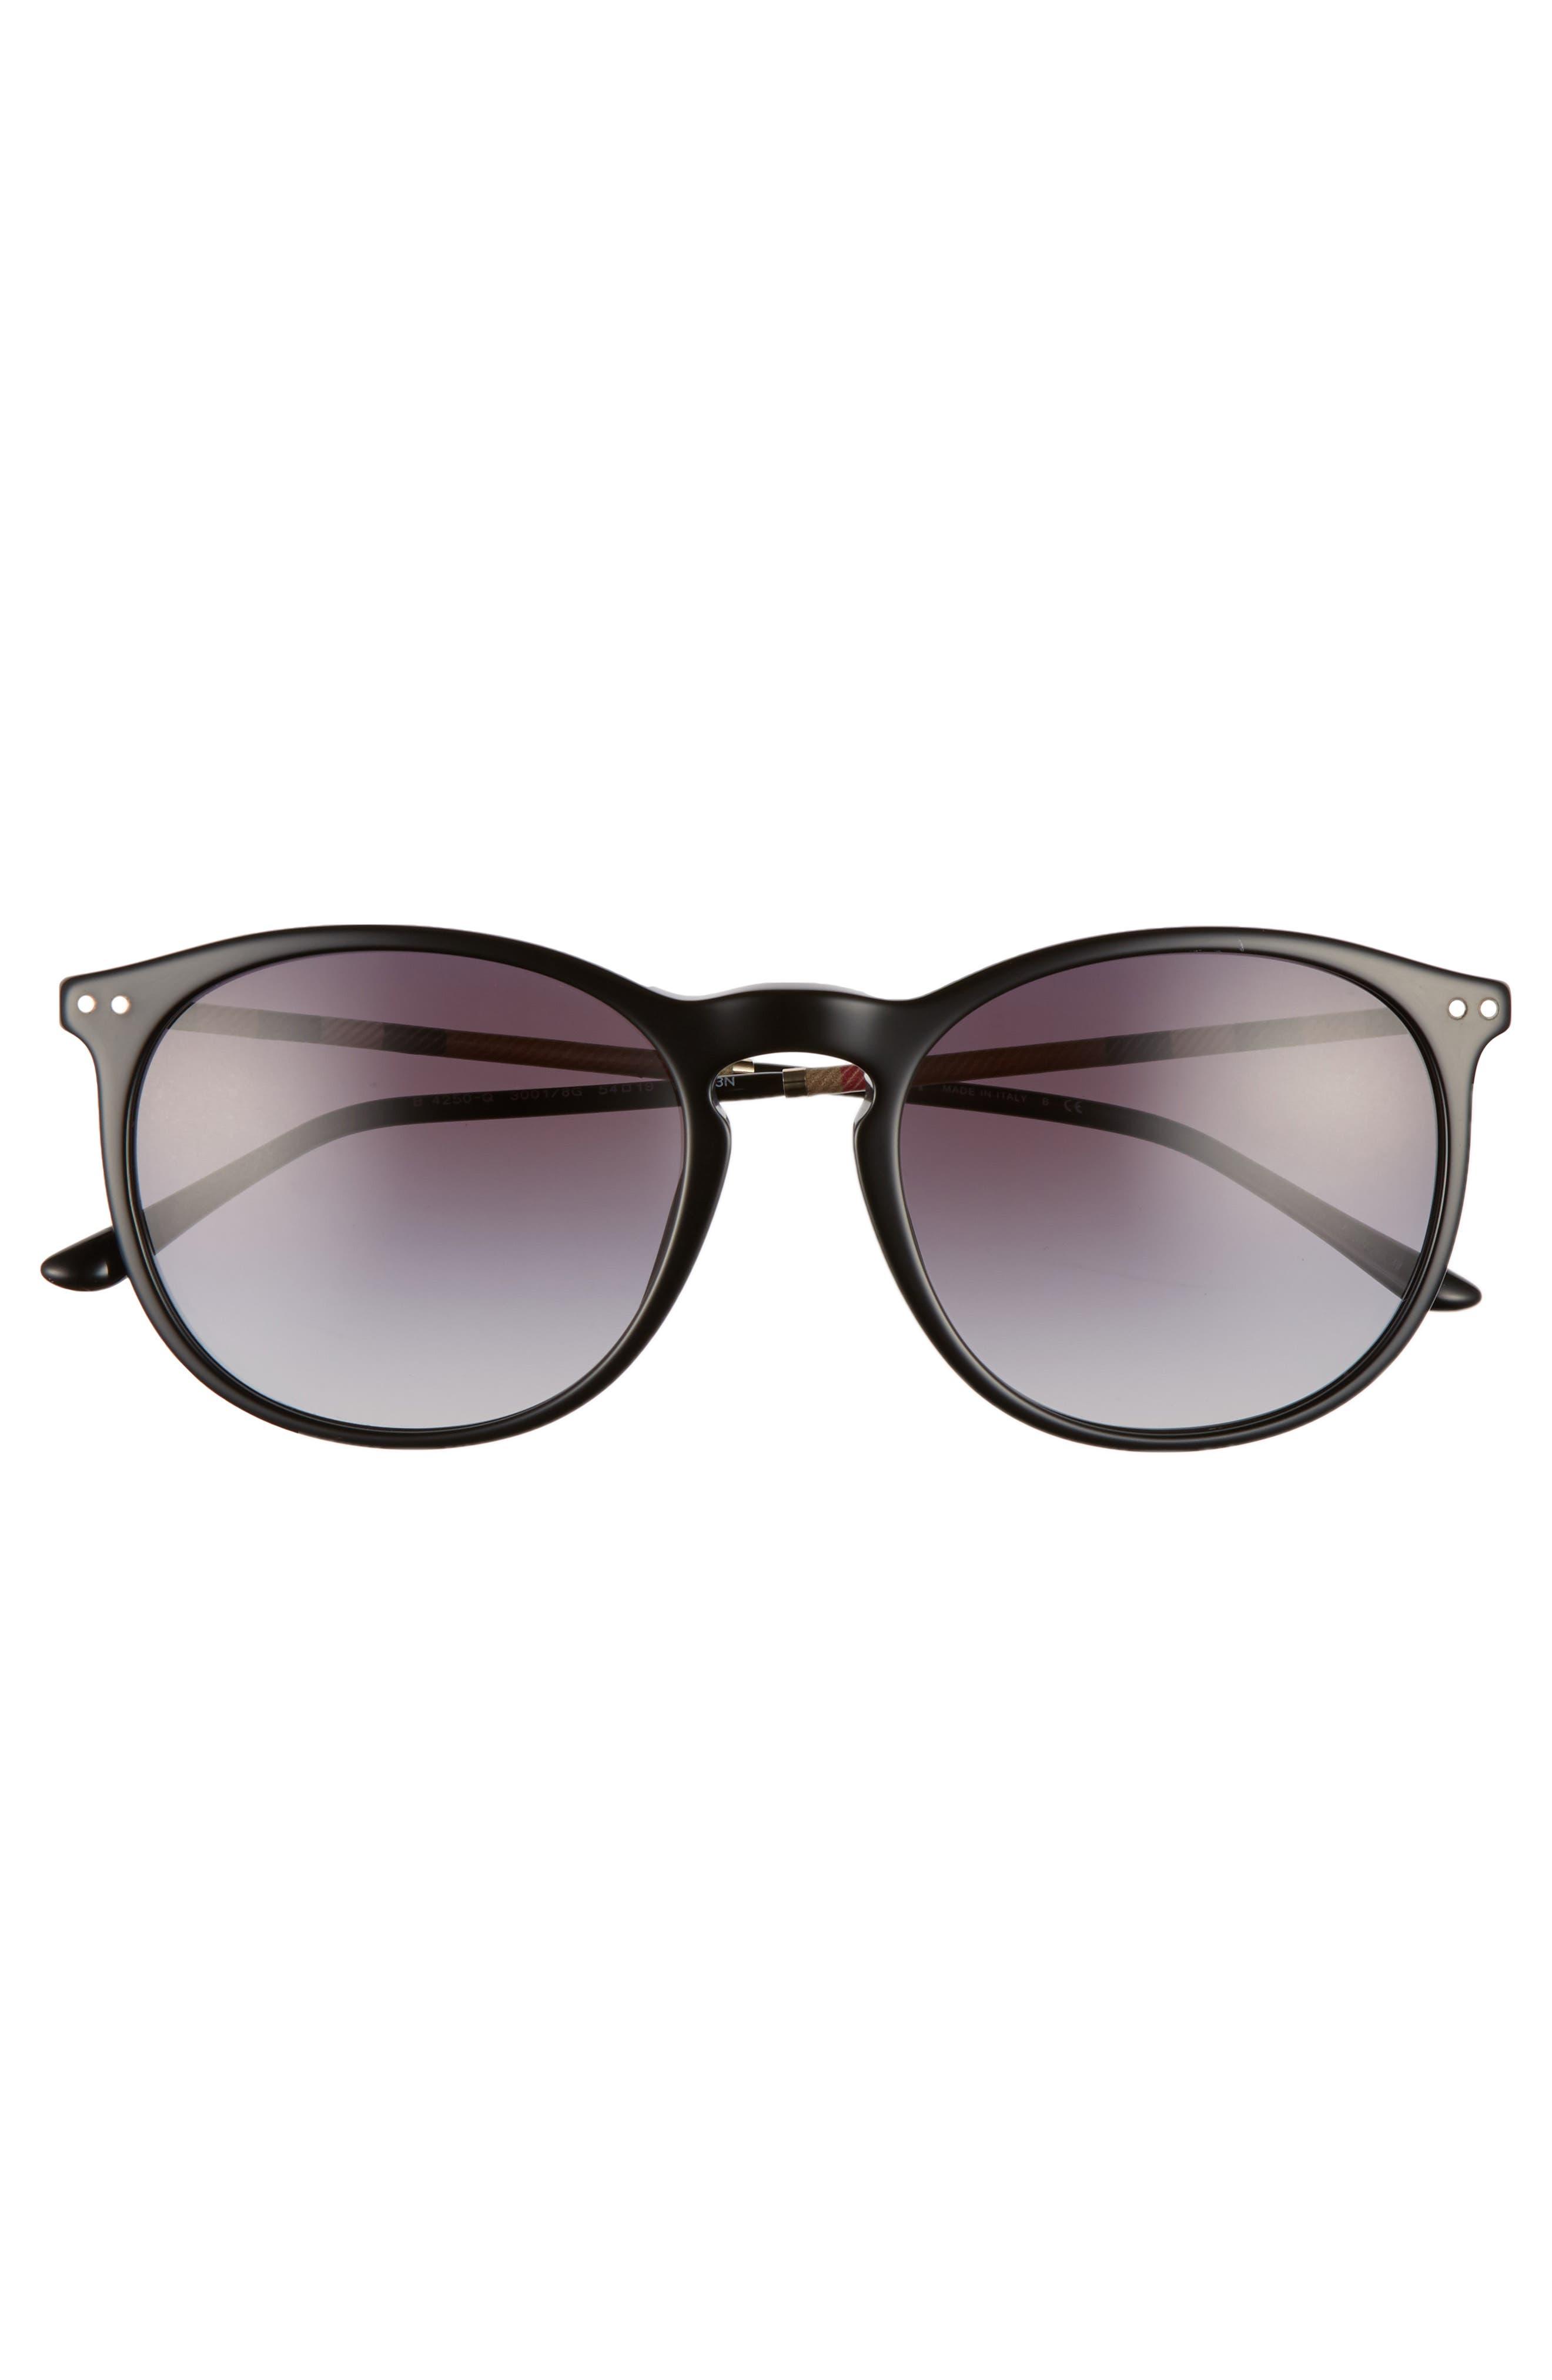 54mm Sunglasses,                             Alternate thumbnail 3, color,                             001